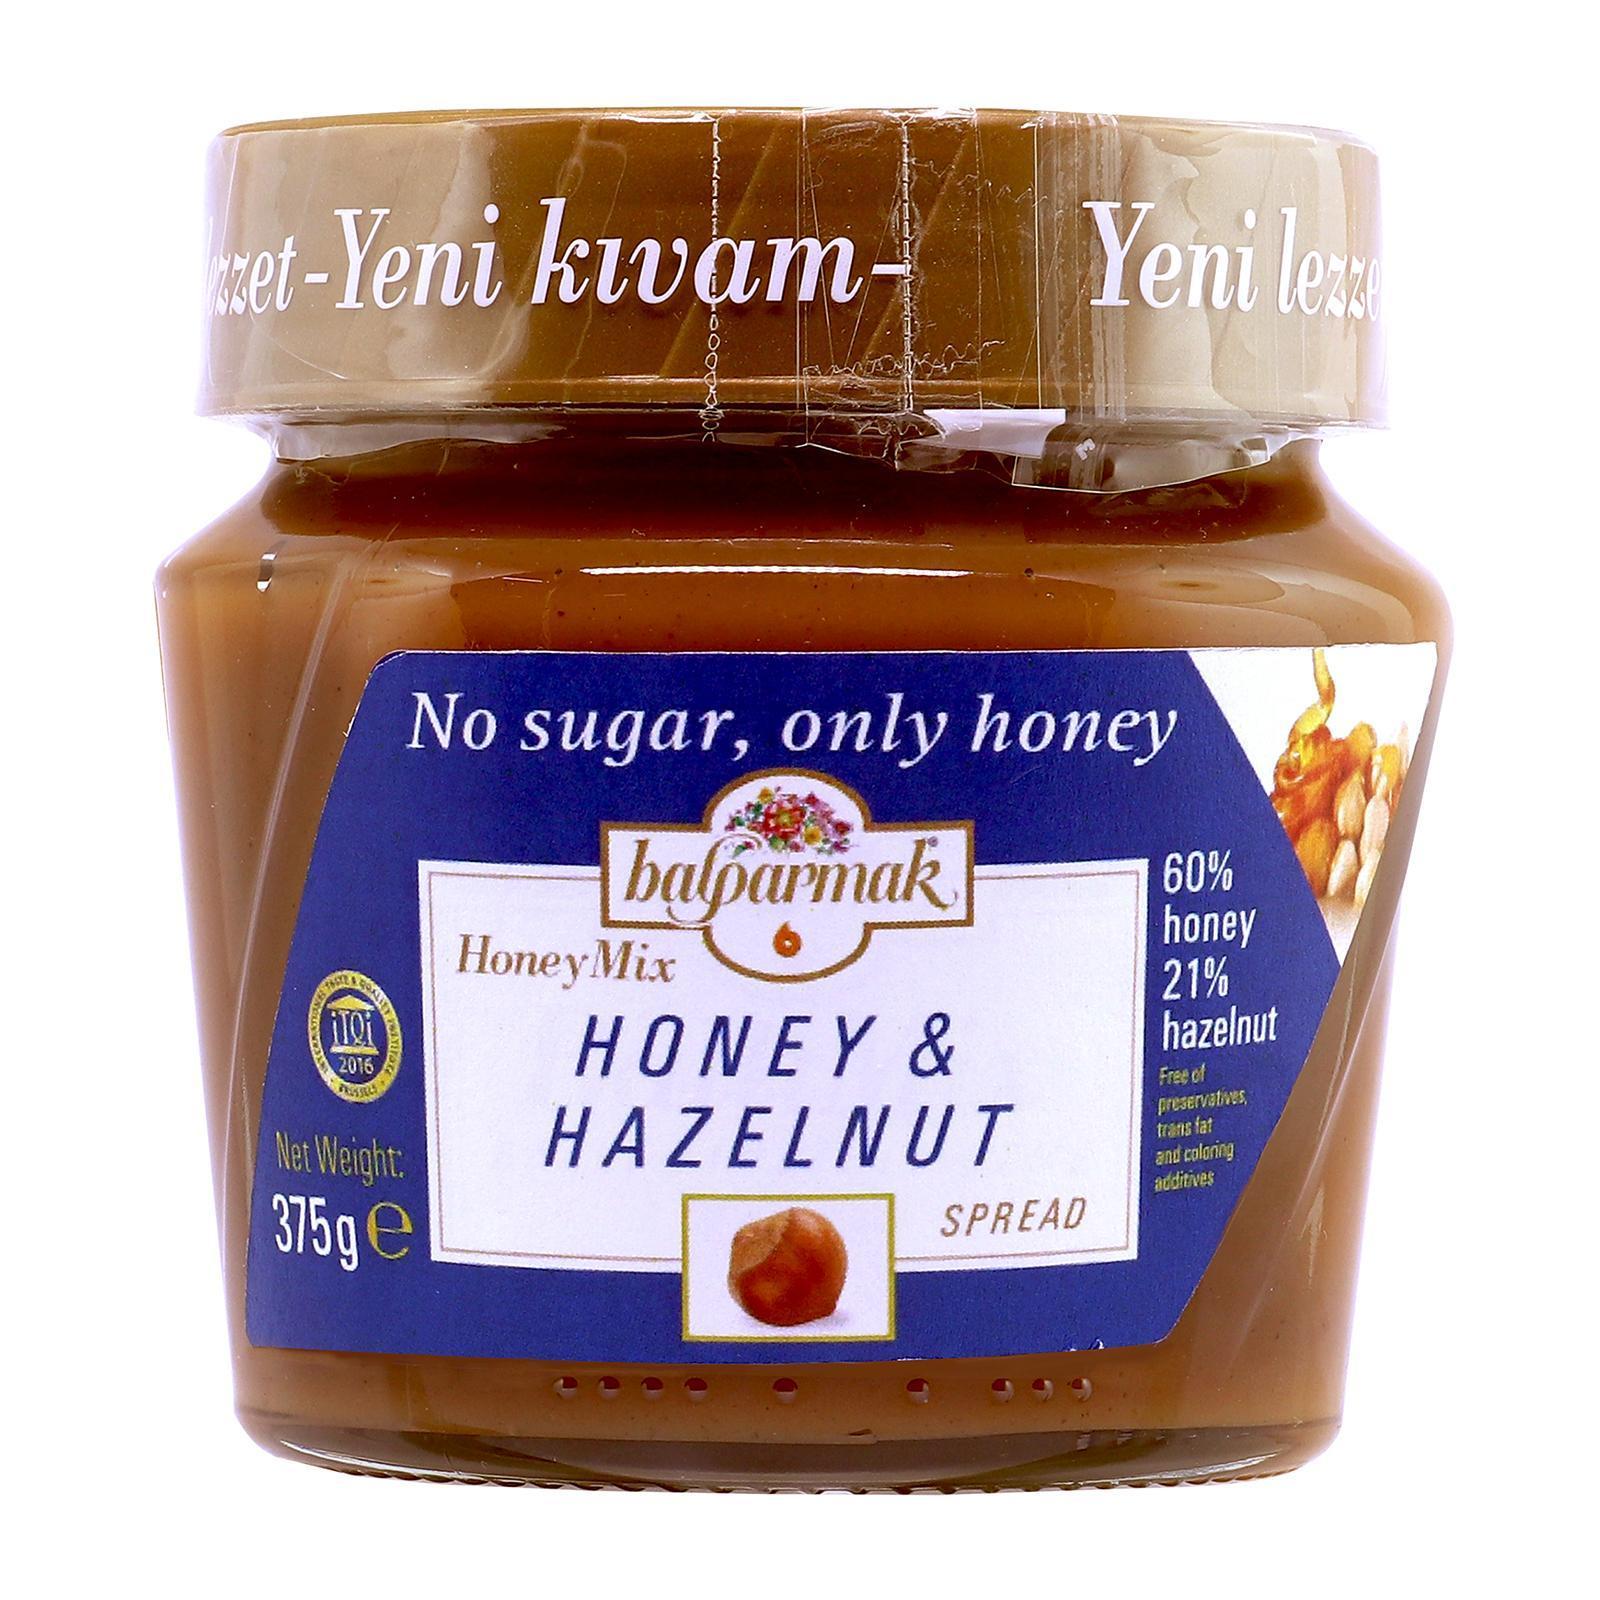 Balparmak Honey Hazelnut Spread - By Nature's Nutrition